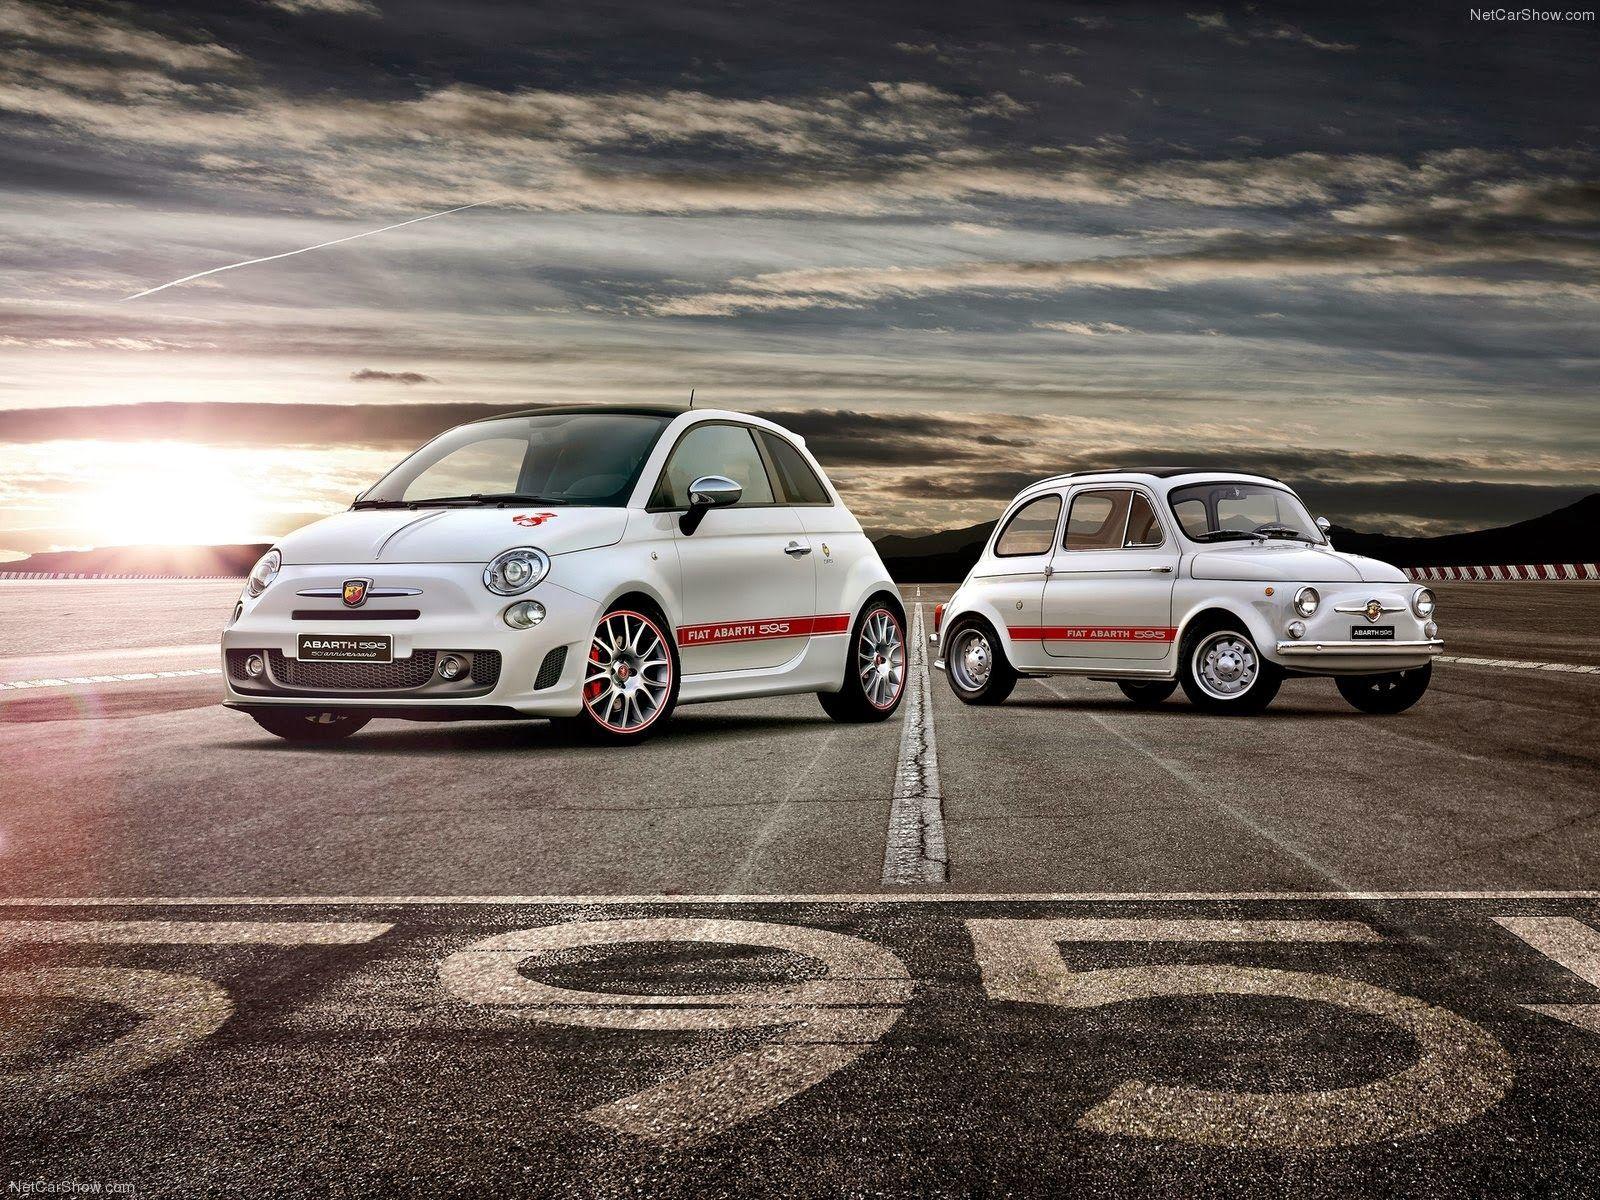 STORMWHEELS: 2014 50th anniversary - FIAT 500 595 ABARTH